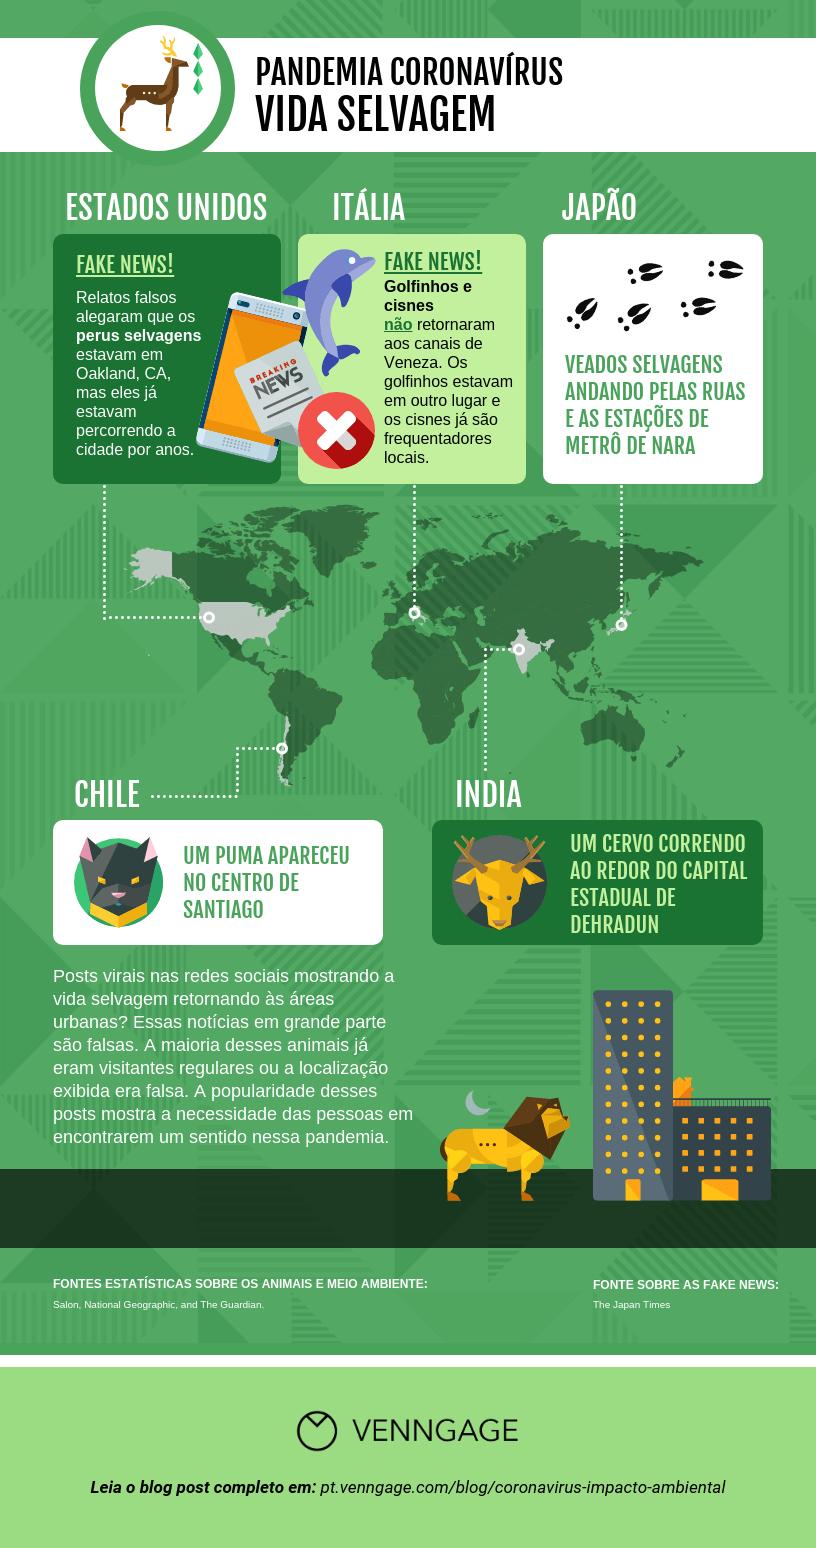 impacto ambiental vida selvagem